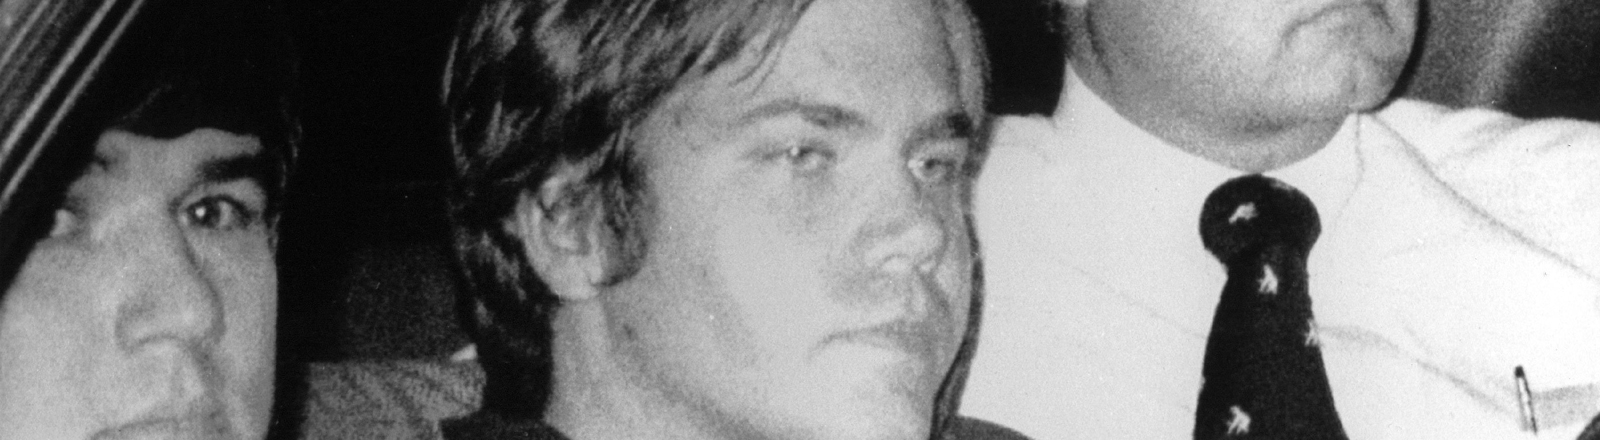 Der mutmaßliche Attentäter John Warnock Hinckley